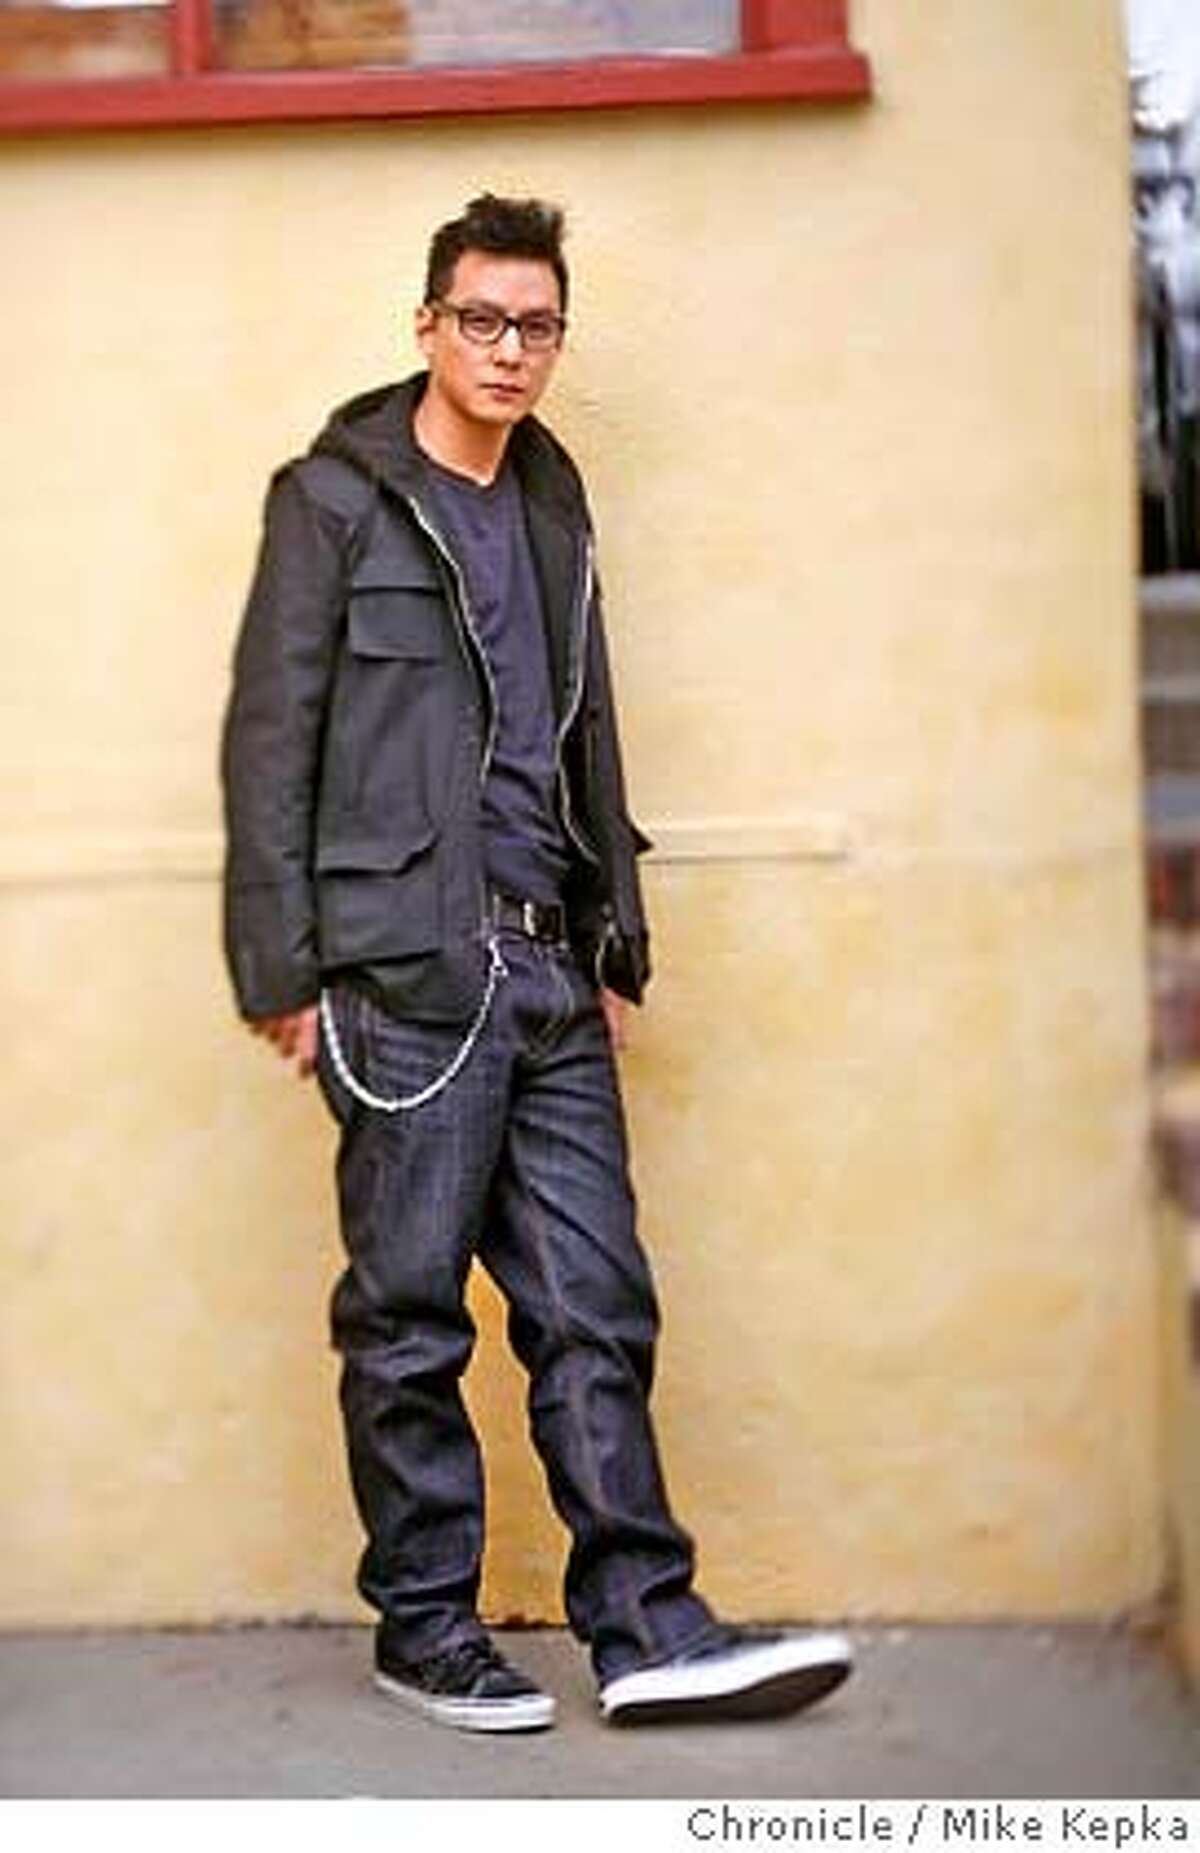 wu2400068_mk.JPG Bay Area-born, Hong Kong movie star Daniel Wu, has directed his first film,